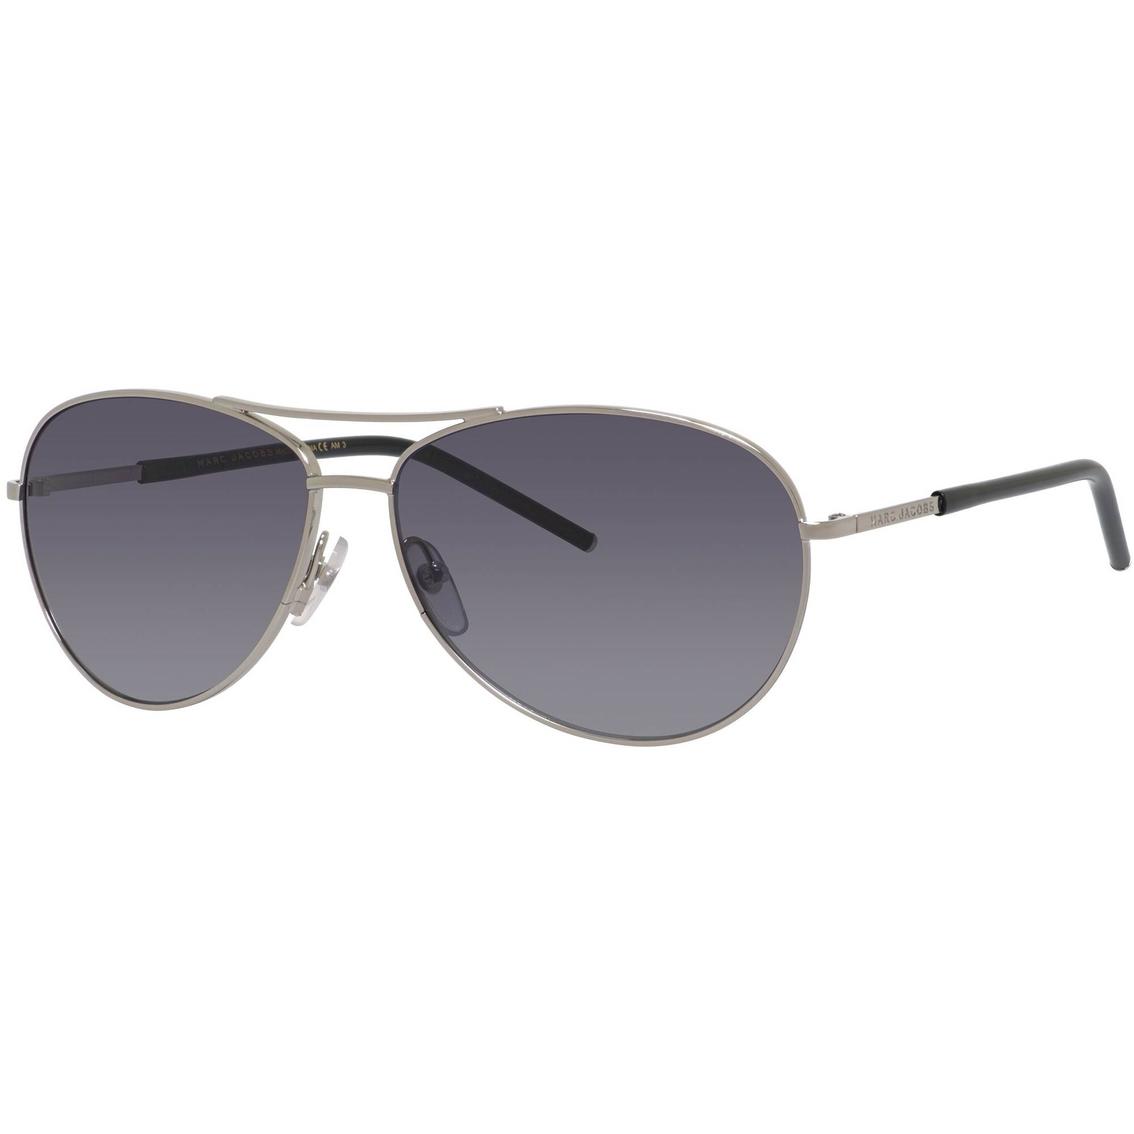 51a41e08b25 Marc Jacobs Marc 59 s Sunglasses